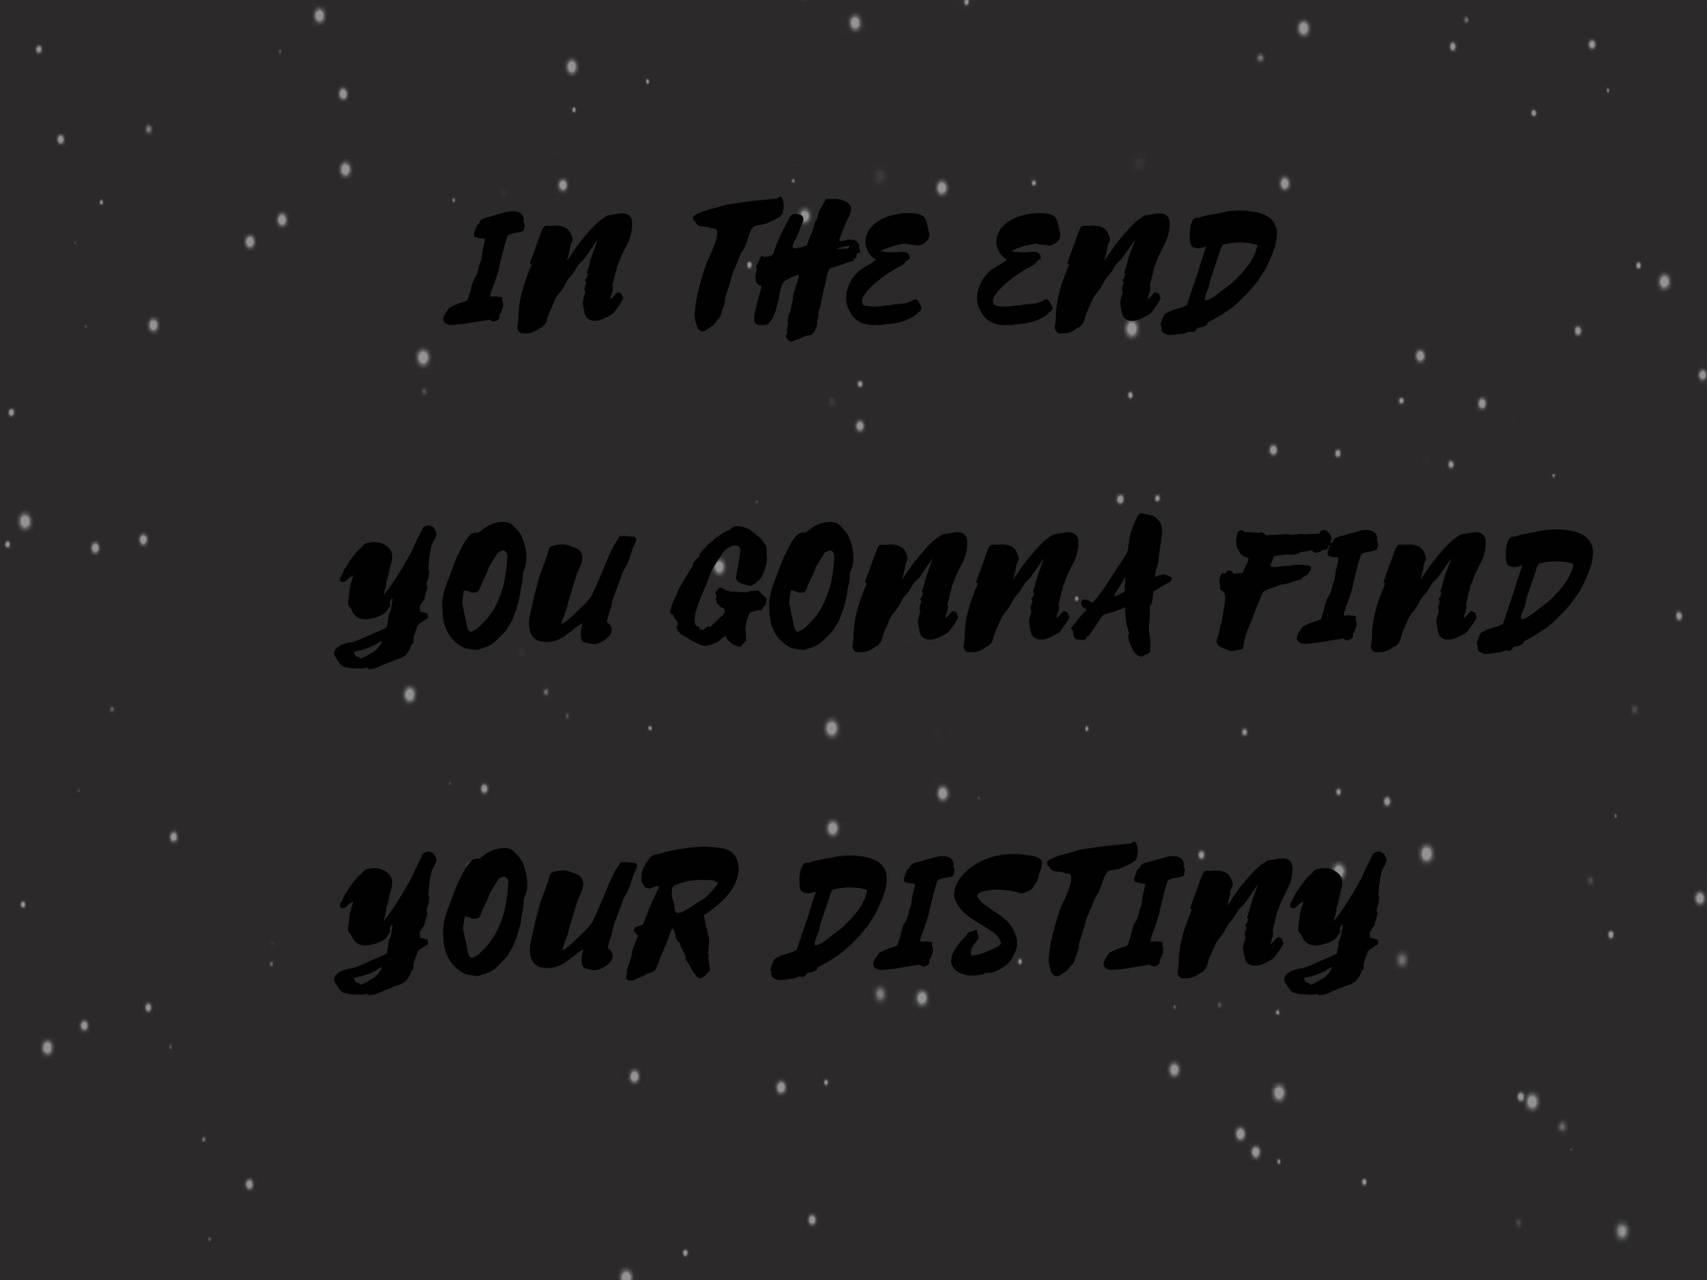 Distiny